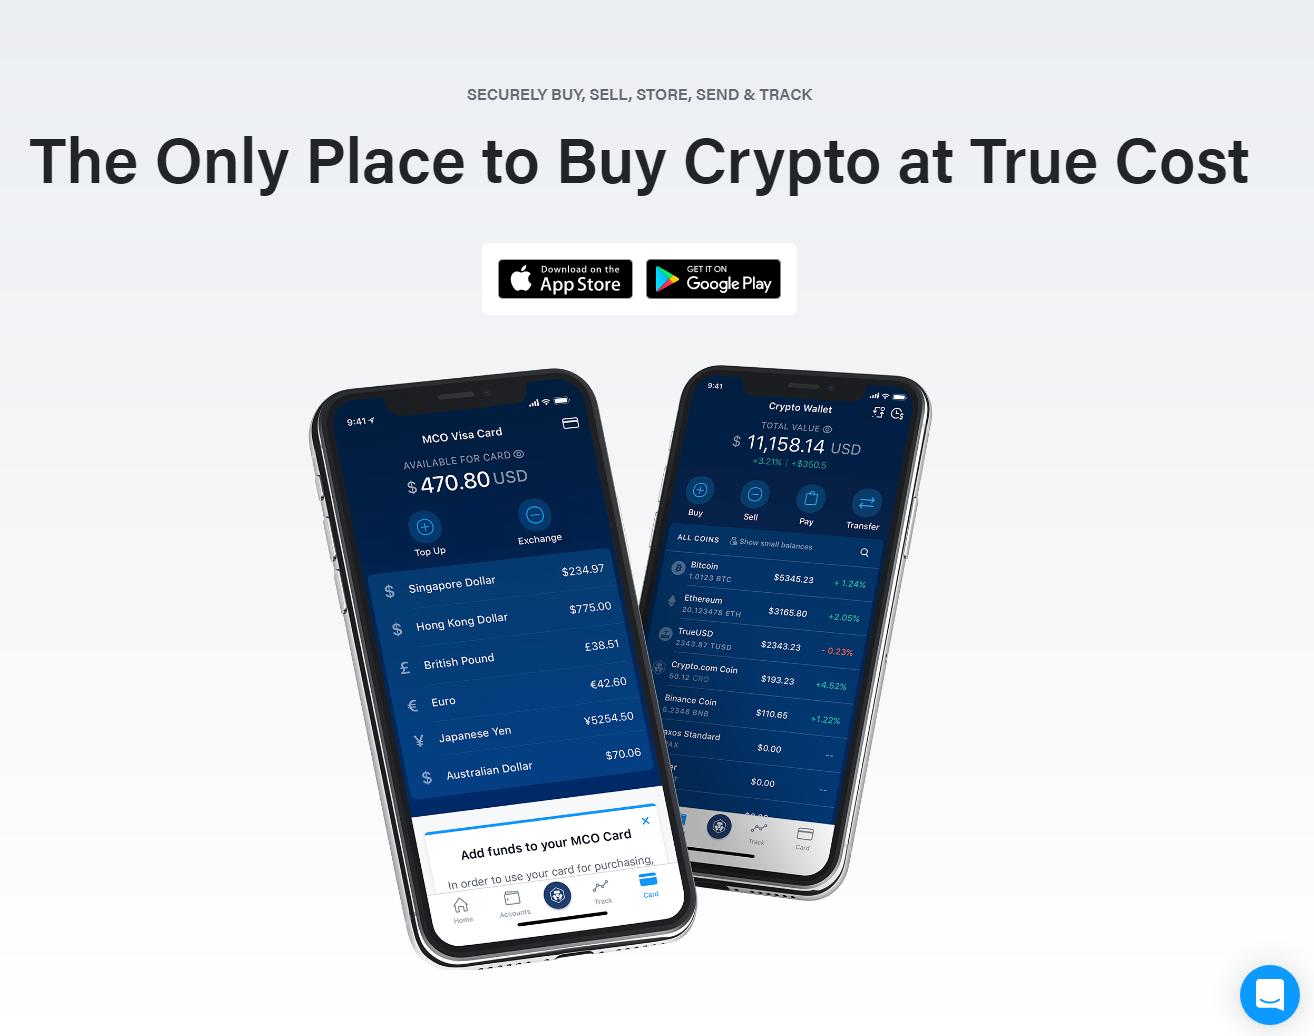 aplikacija za posrednike kriptovaluta kako zaraditi novac radeći bitcoin